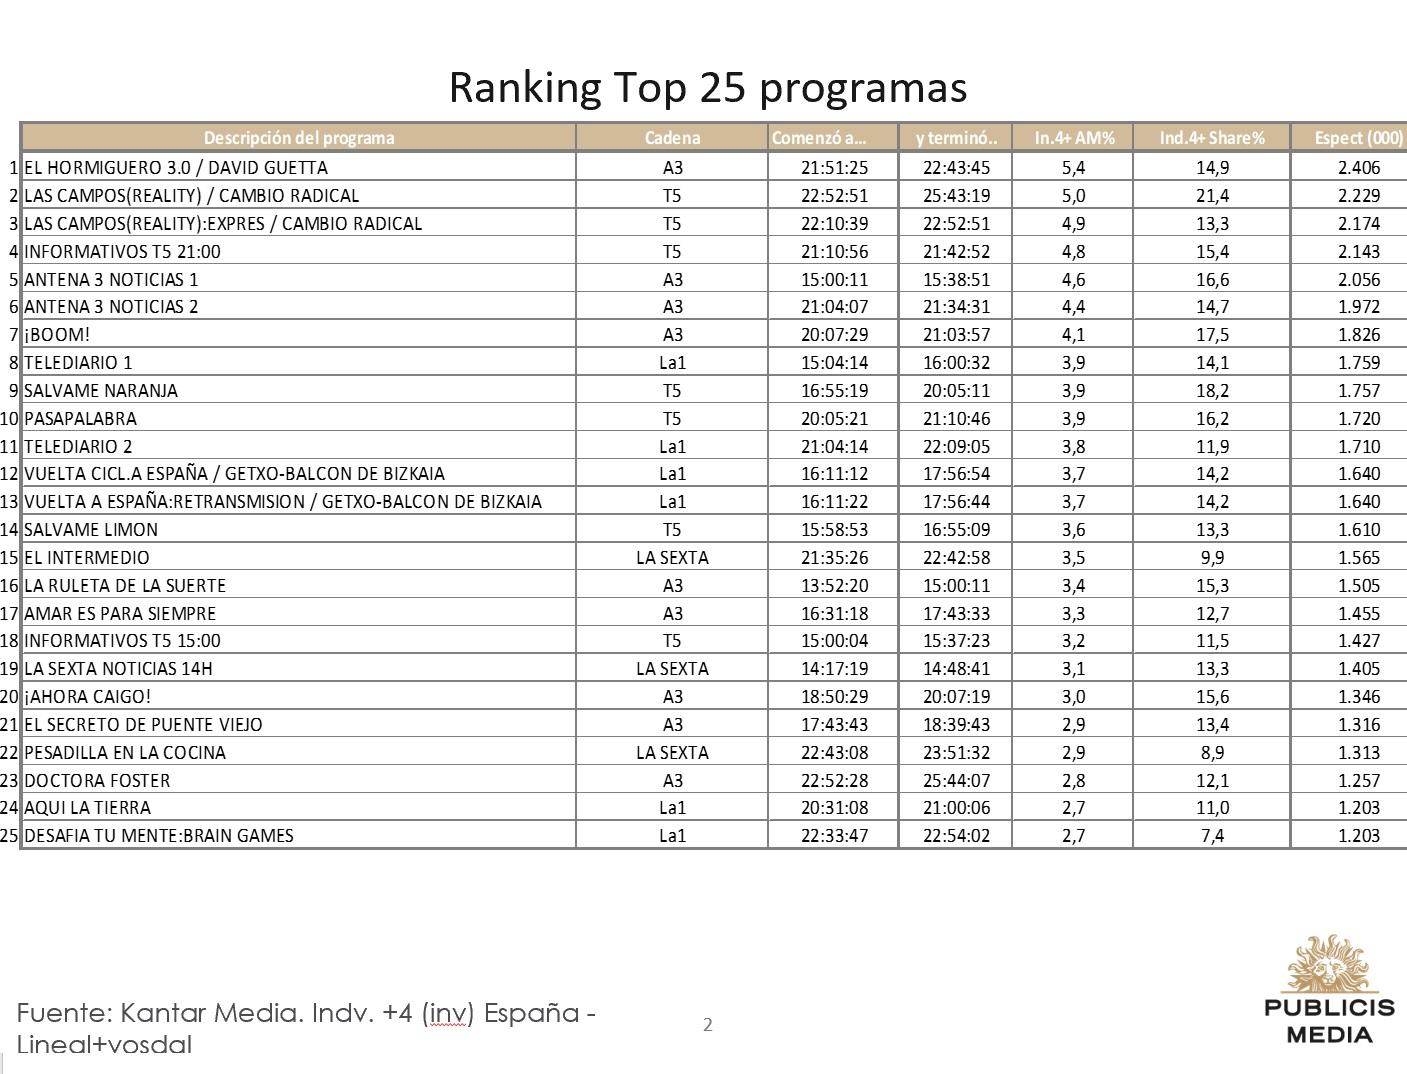 https://www.programapublicidad.com/wp-content/uploads/2018/09/top-25-publicis-media-12-sep-2018-programapublicidad-muy-grande.jpg